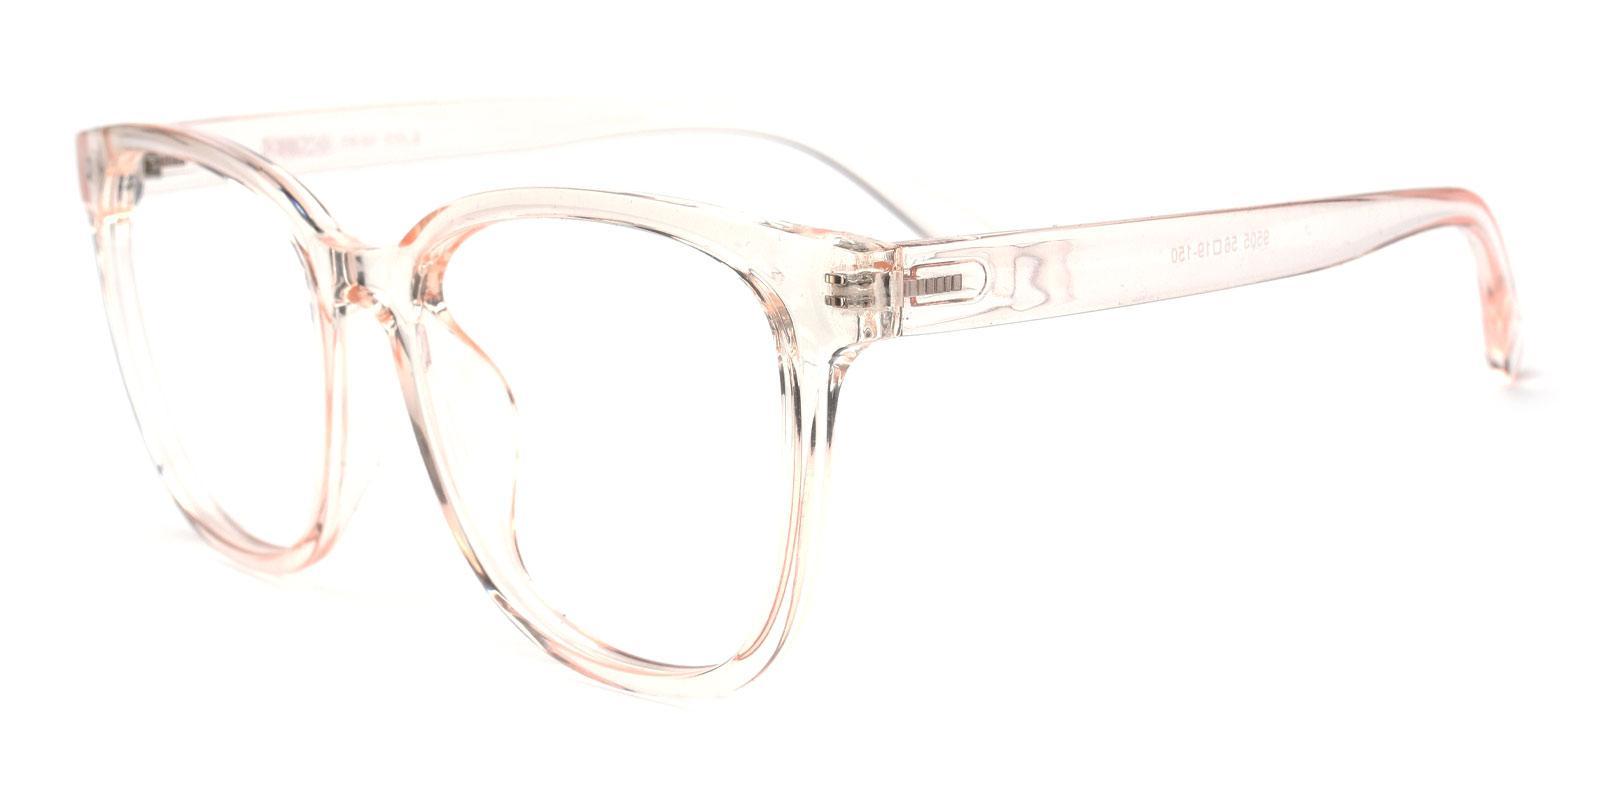 Edgar-Orange-Square-TR-Eyeglasses-additional1